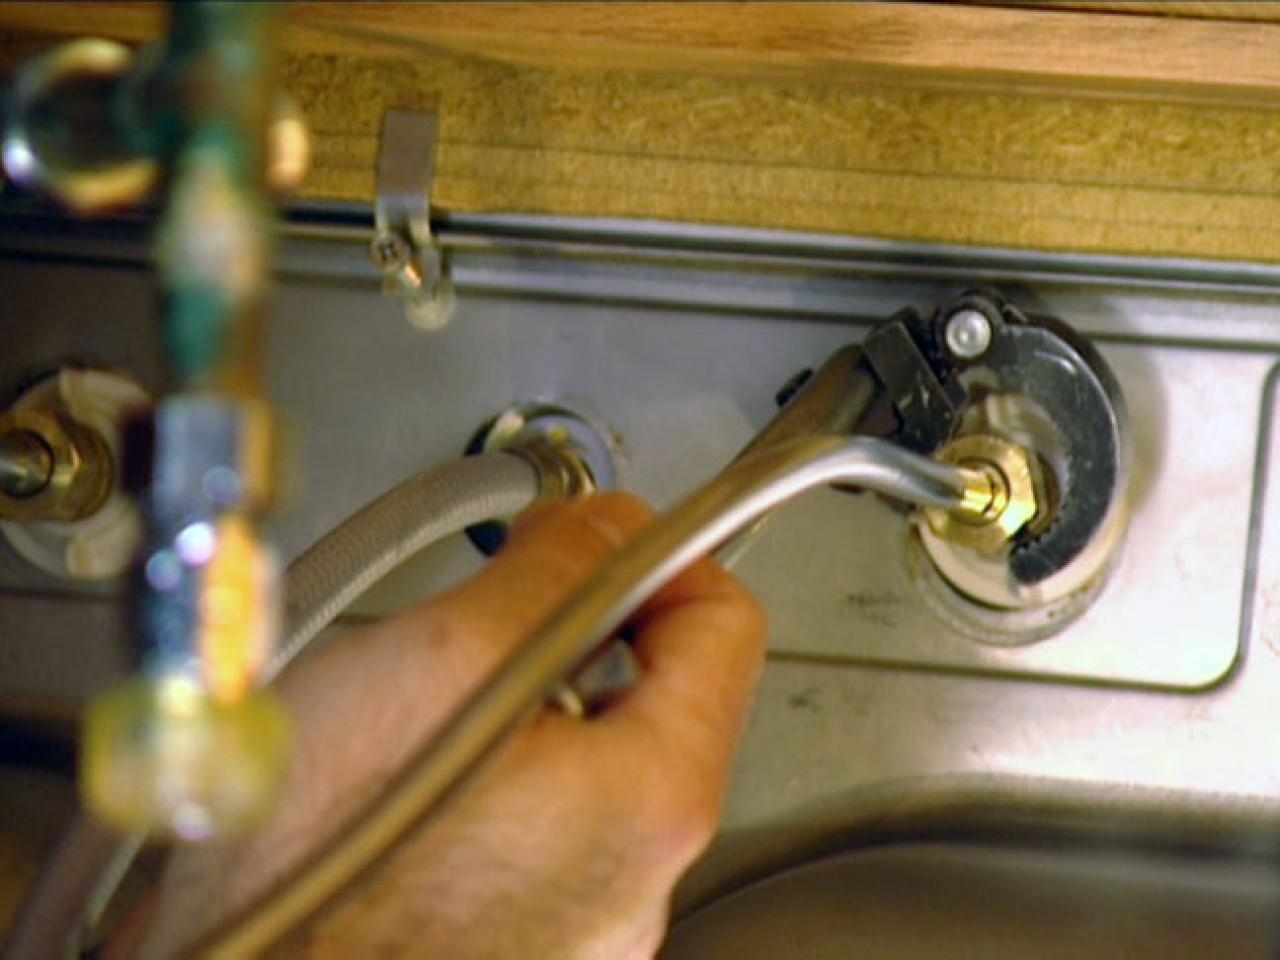 Ideas, faucet retaining nut stuck faucet retaining nut stuck replacing faucet mounting nut wonderful kitchen ideas 1280 x 960 jpeg.